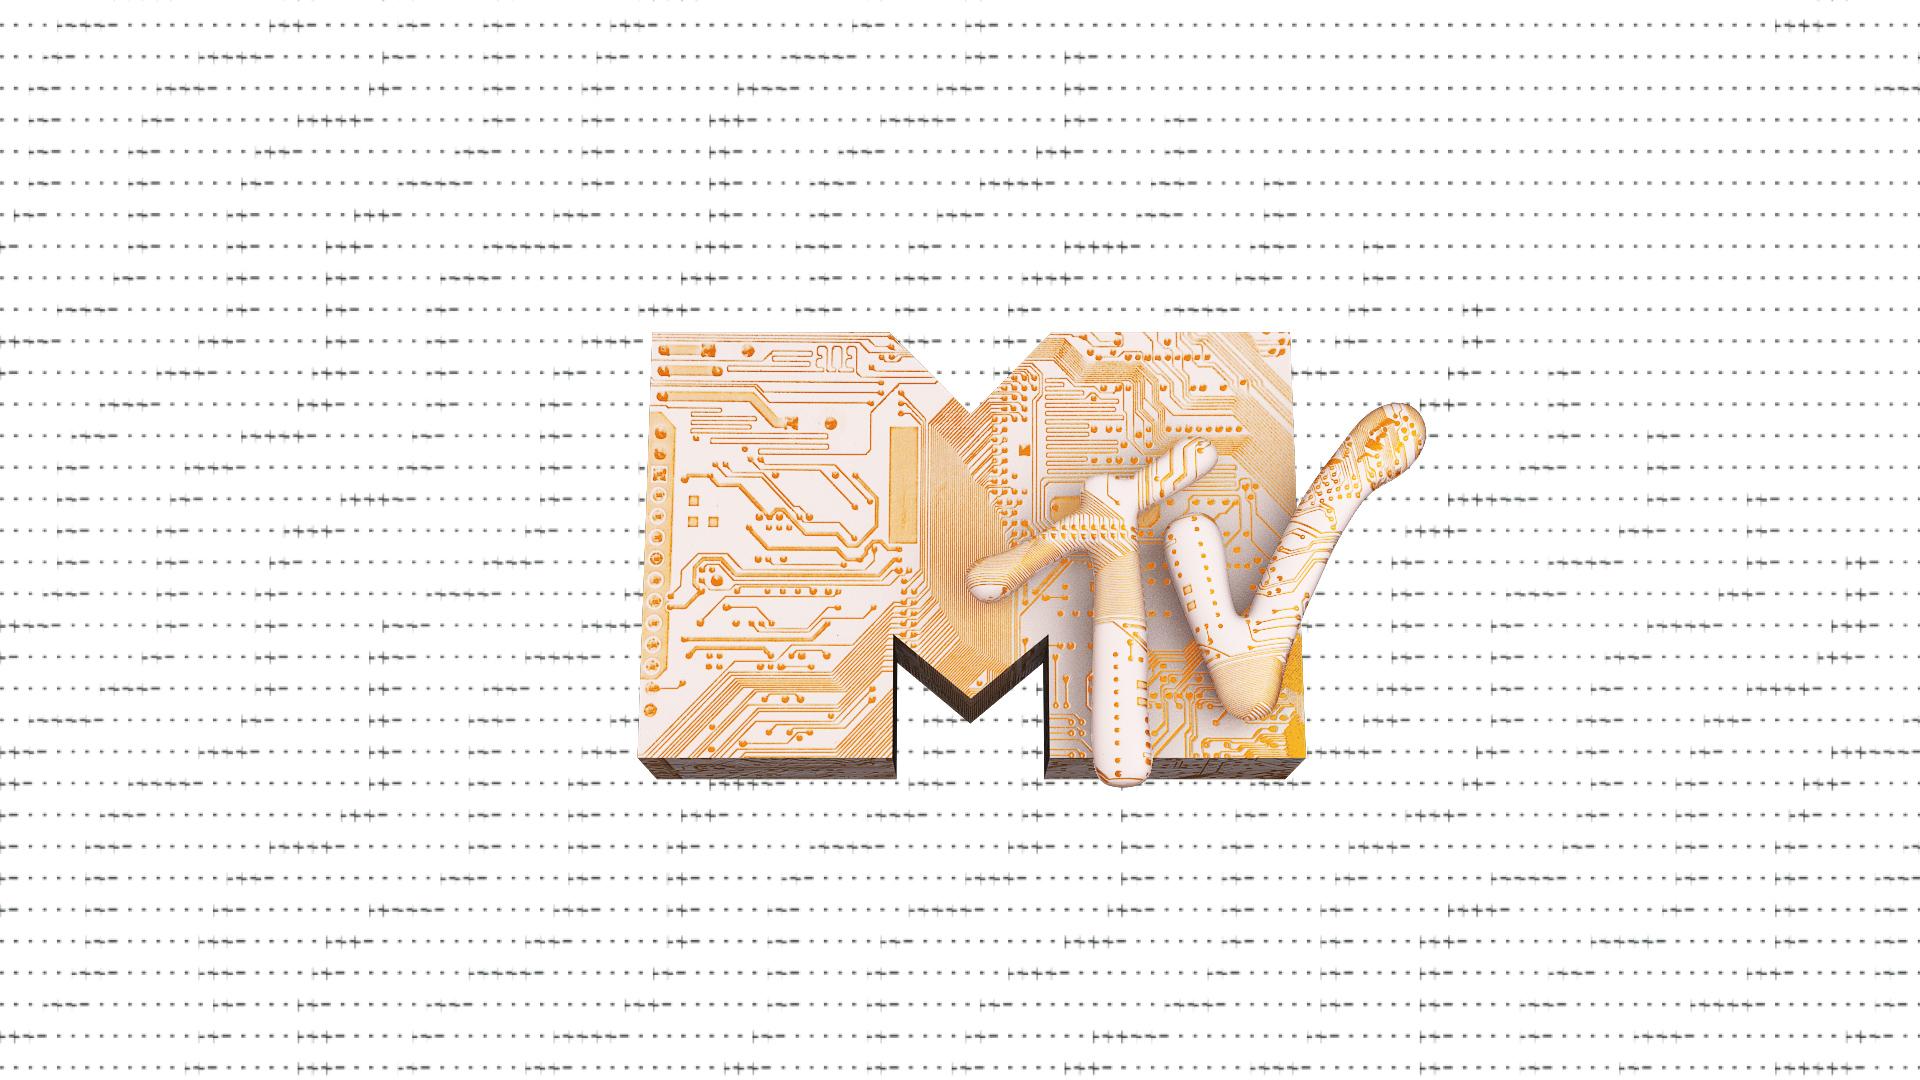 MTV_OS_LOGO_4